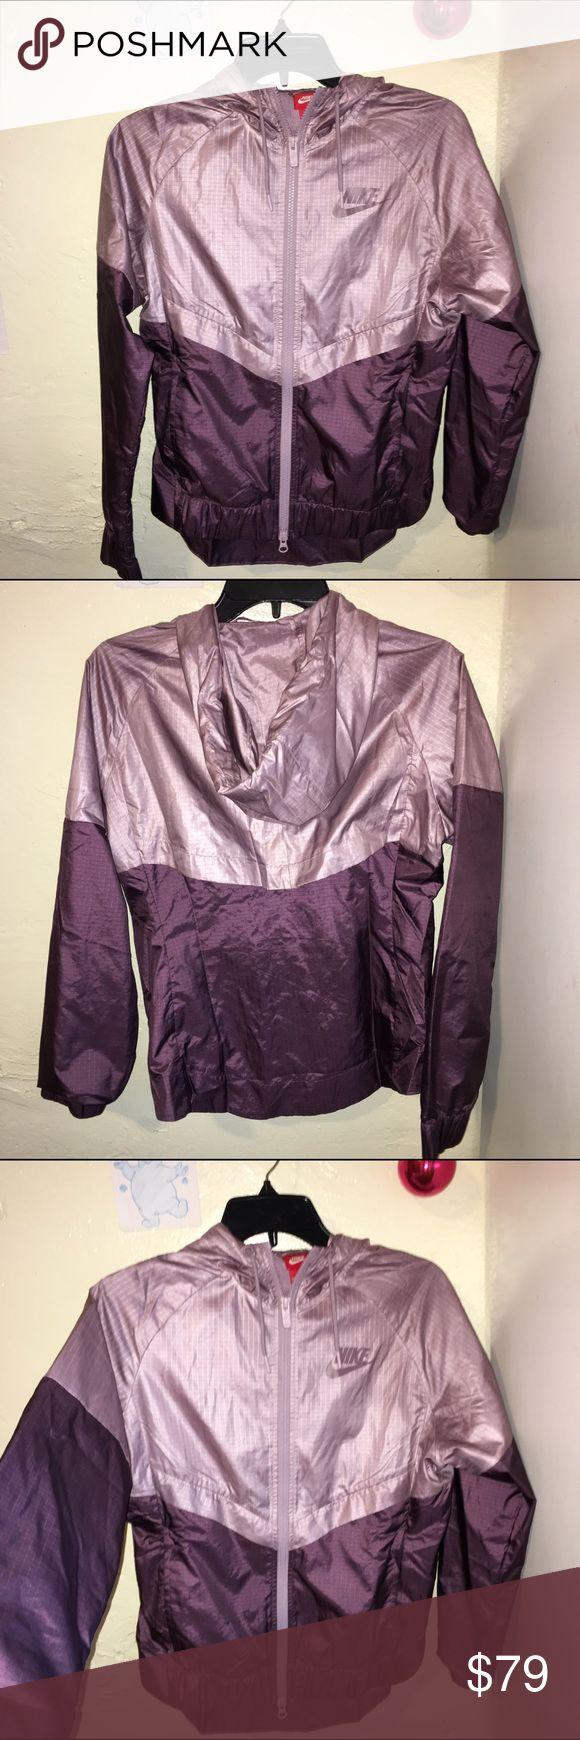 ❗️ TODAY ONLY ❗️ Nike Windbreaker Nike Windbreaker. Super cute! Color light purple. Brand new. Size x-small. Retail price is $90 Nike Jackets & Coats